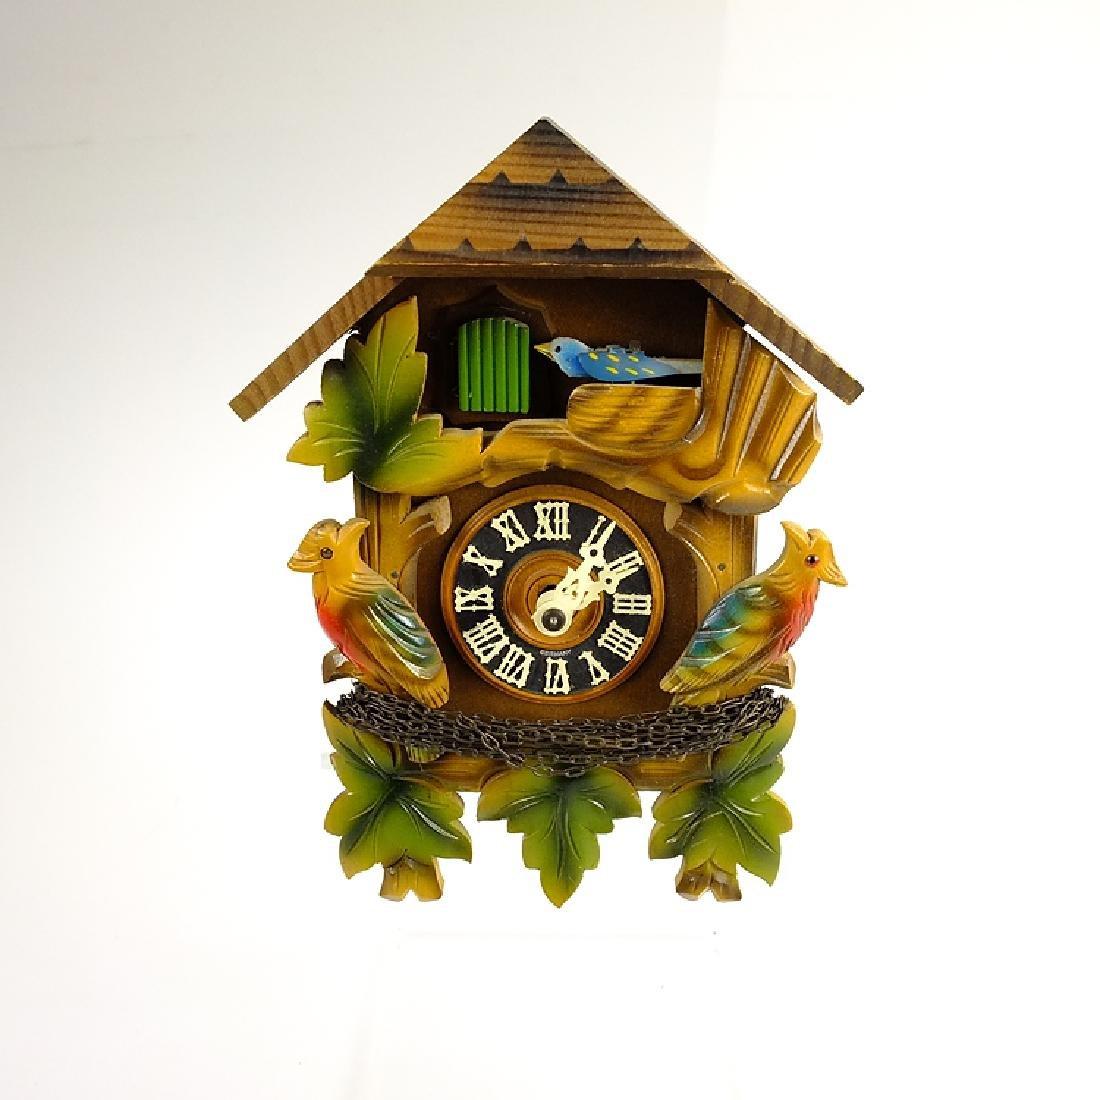 Black Forest Clock VINTAGE CUCKOO CLOCK HUBERT HERR